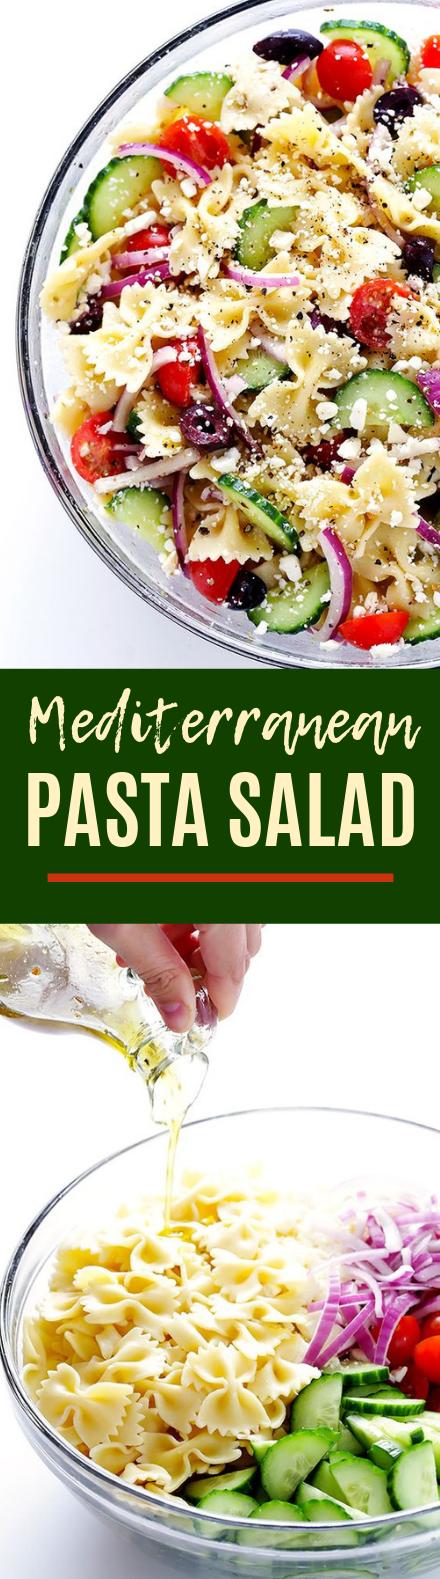 Mediterranean Pasta Salad #healthy #sidedish